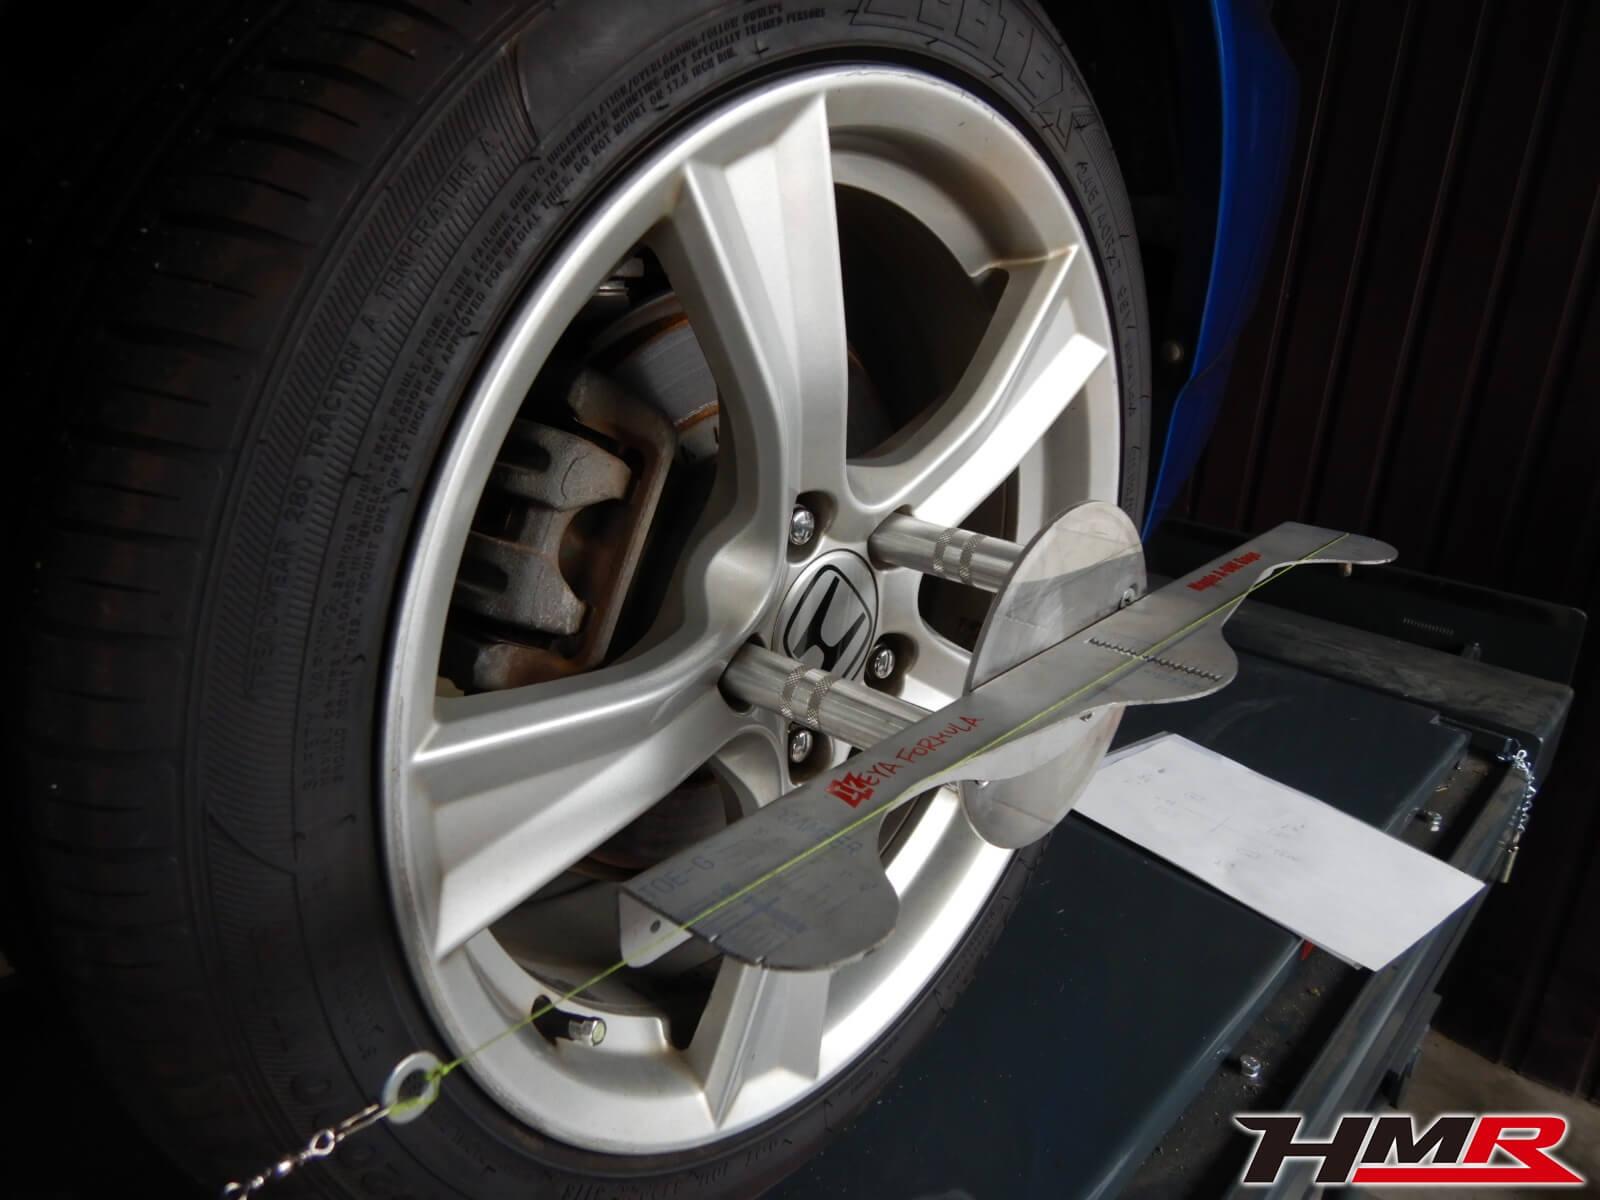 S2000(AP2)ロアアーム アライメント調整